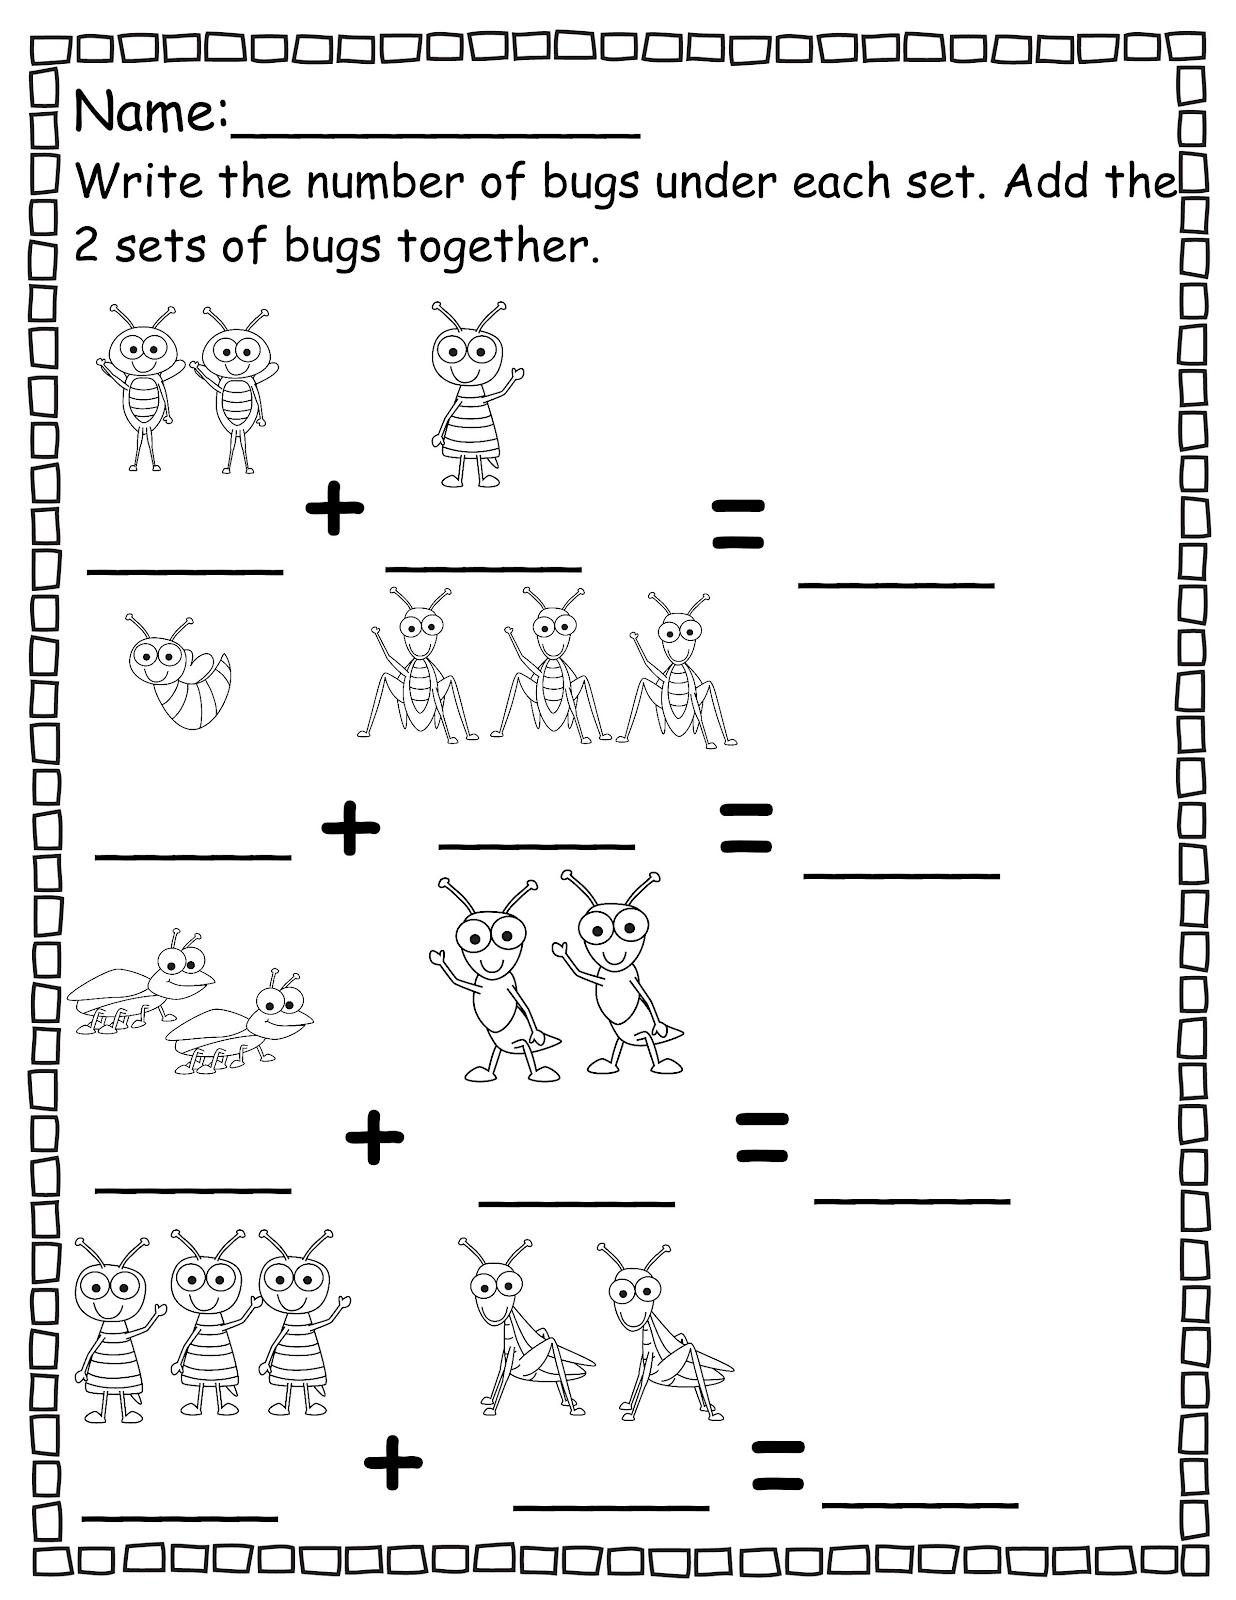 free pre kindergarten worksheets Brandonbriceus – Homework Kindergarten Worksheets